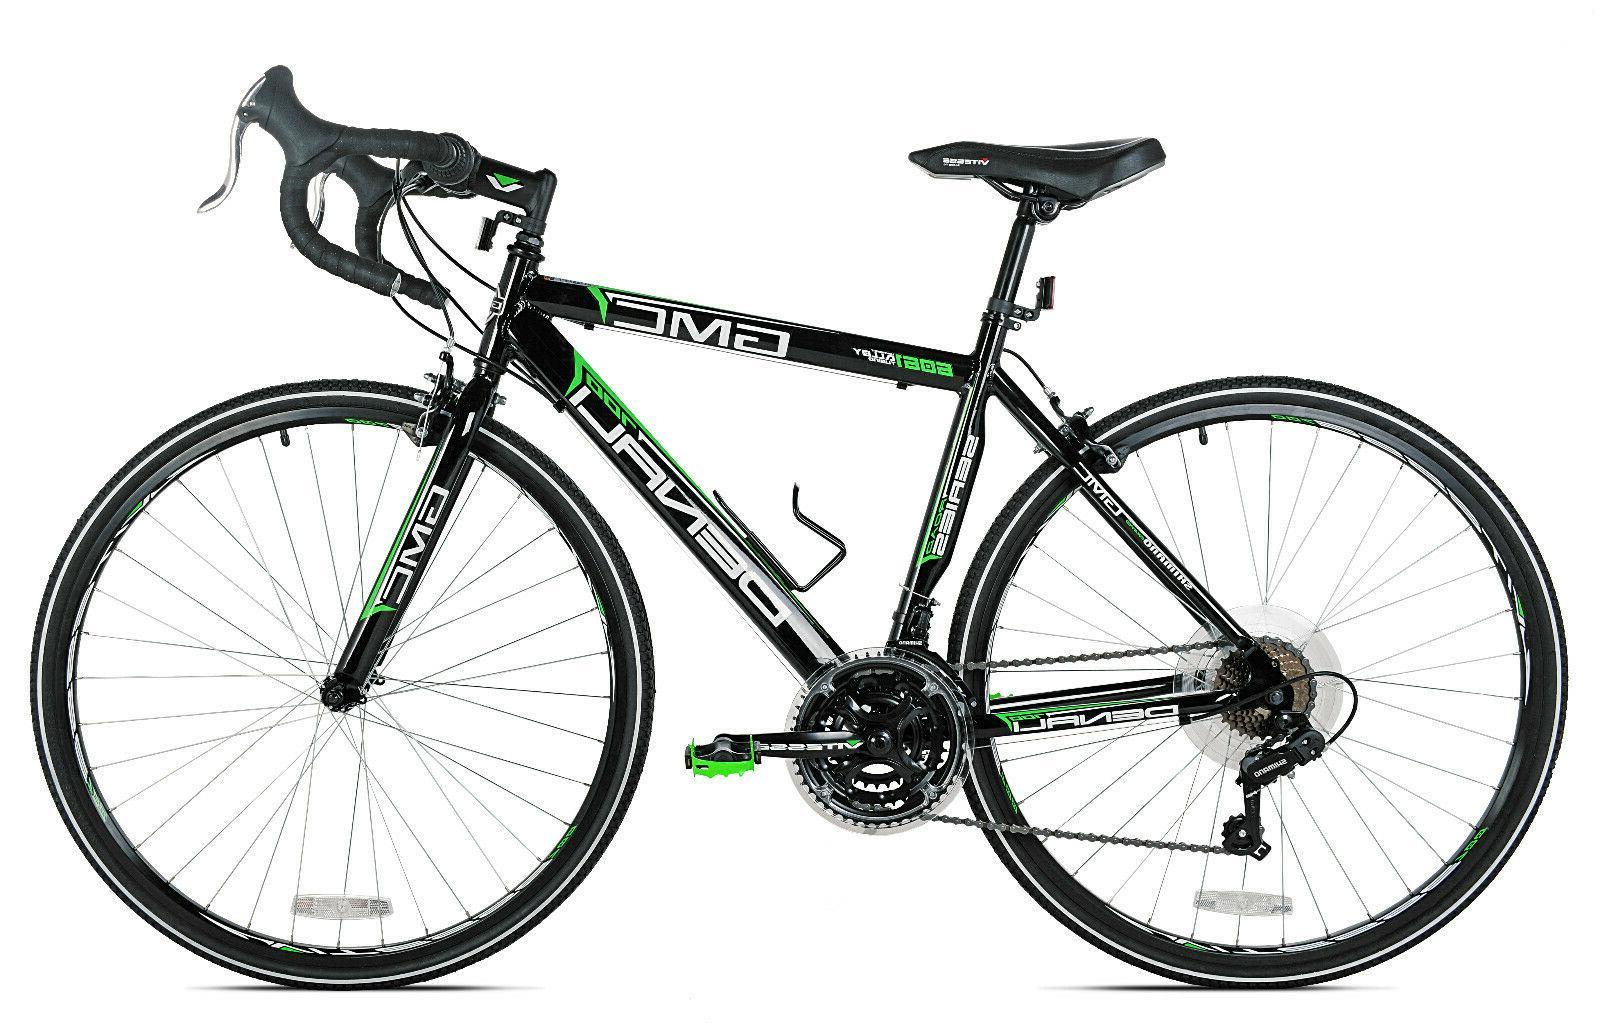 GMC Denali Aluminum Frame Bike Black Green 21 Speed